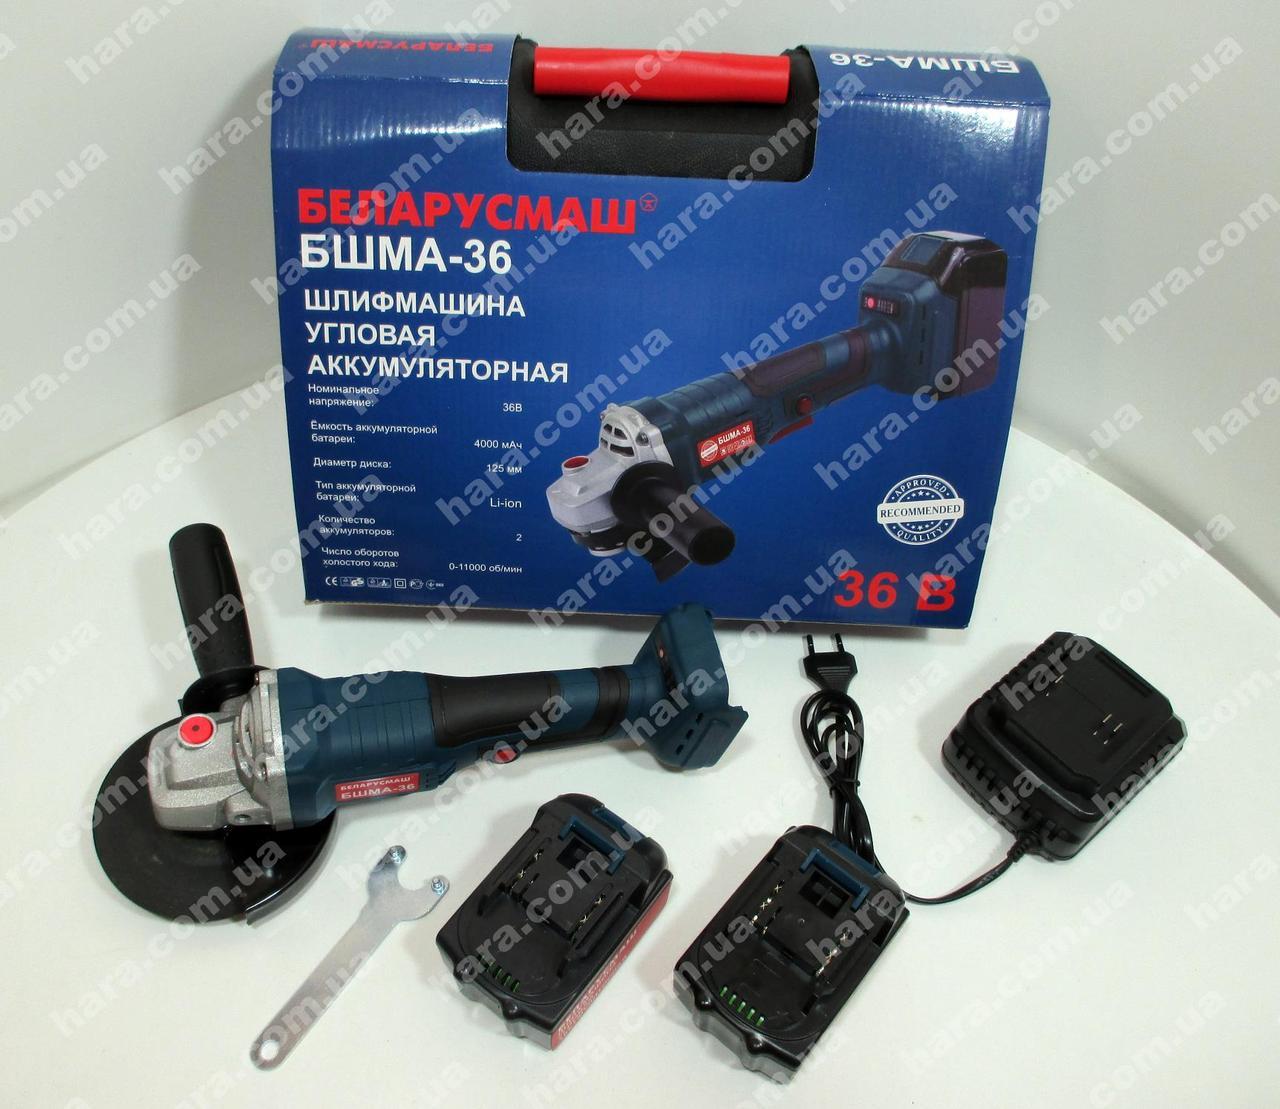 Болгарка аккумуляторная Беларусмаш БШМА-36 (2 аккум.,125 круг)